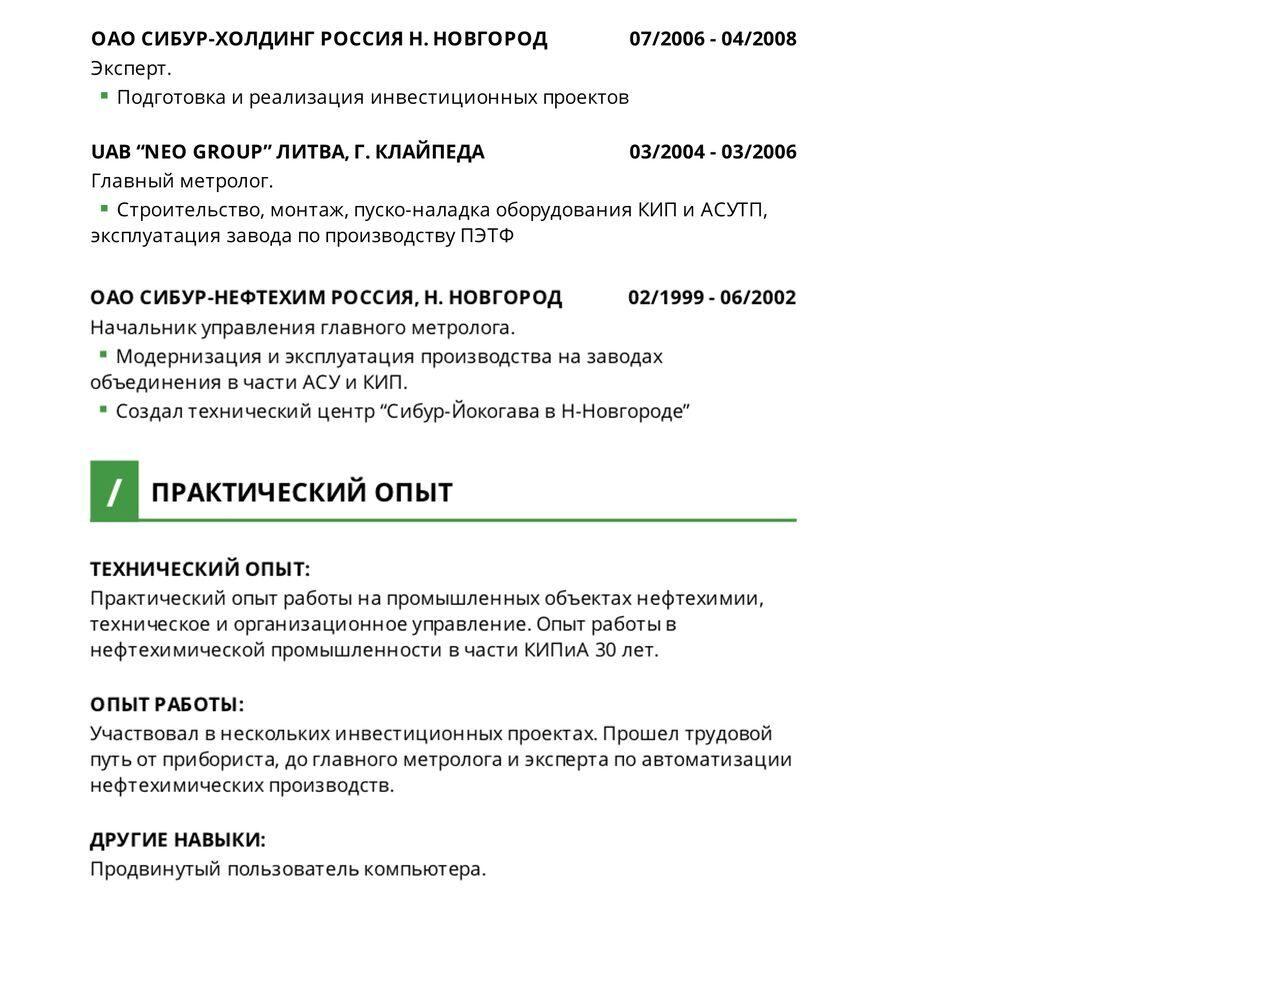 Вячеслав Боронкин 2 половина